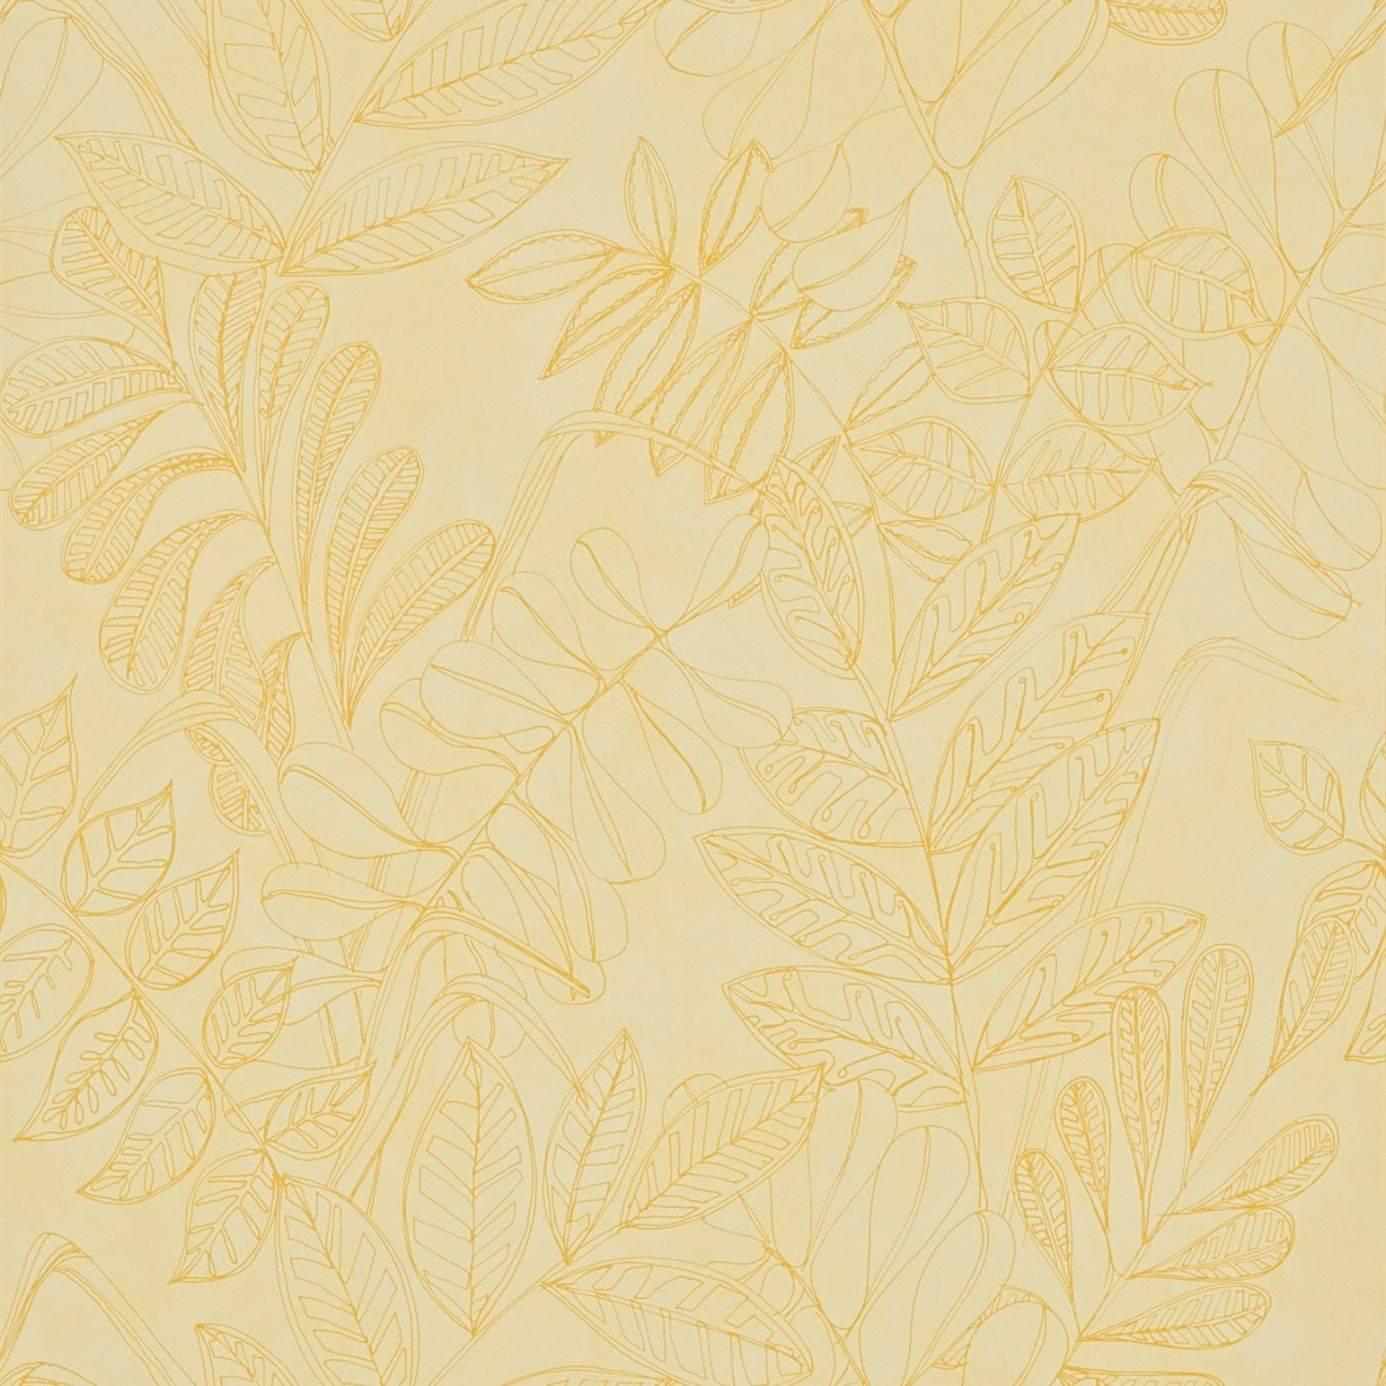 Mustard Design Wallpaper : Tropical leaf wallpaper mustard buttermilk